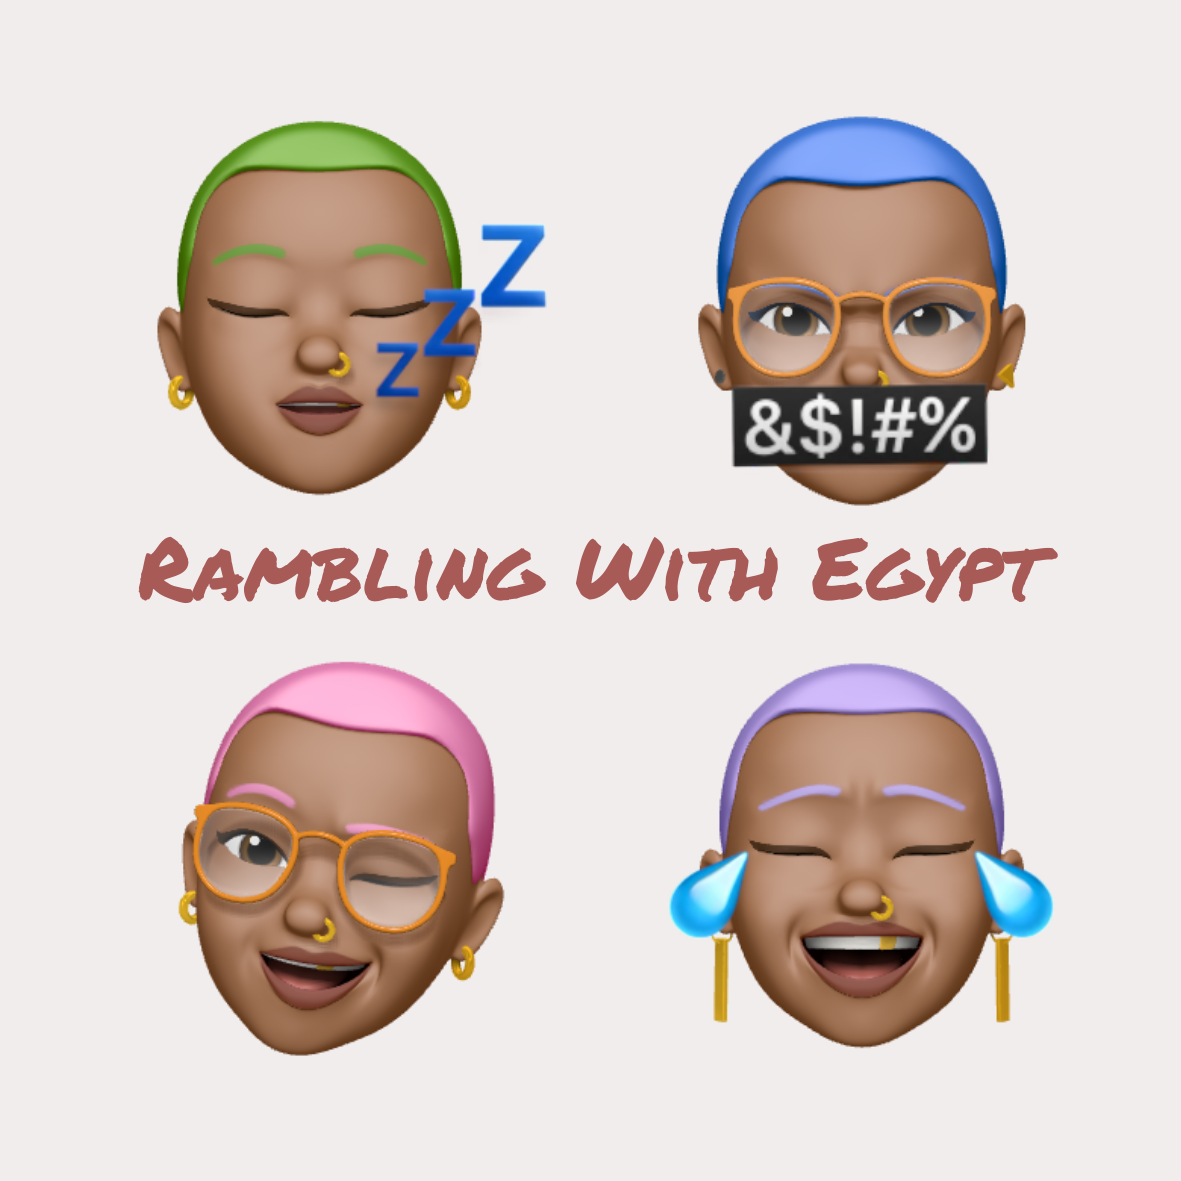 Rambling with Egypt